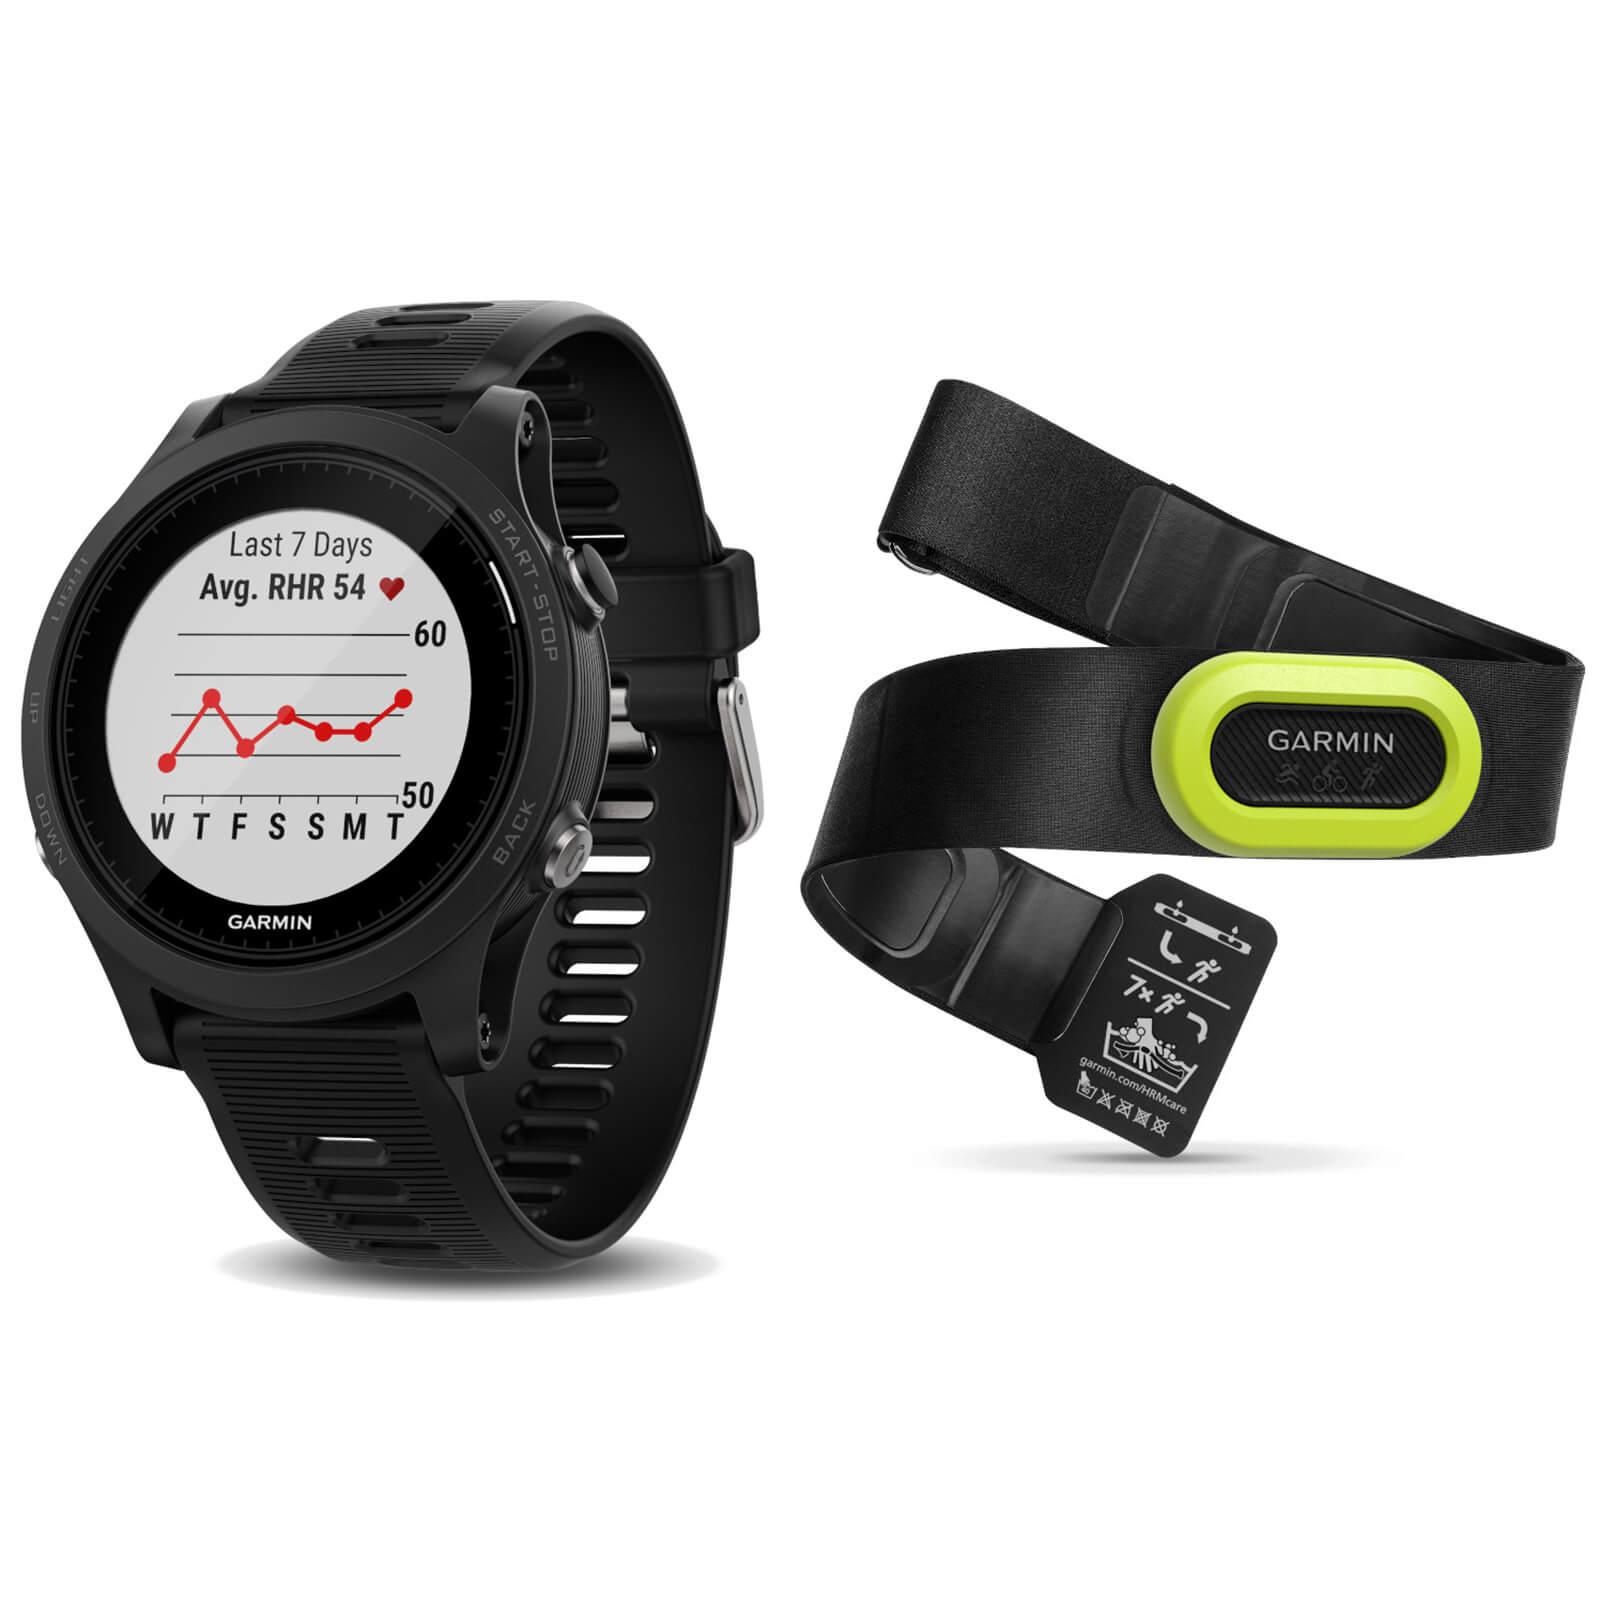 Garmin Forerunner 935 GPS Multisport Watch/HRM-Pro Heart Rate Monitor Bundle